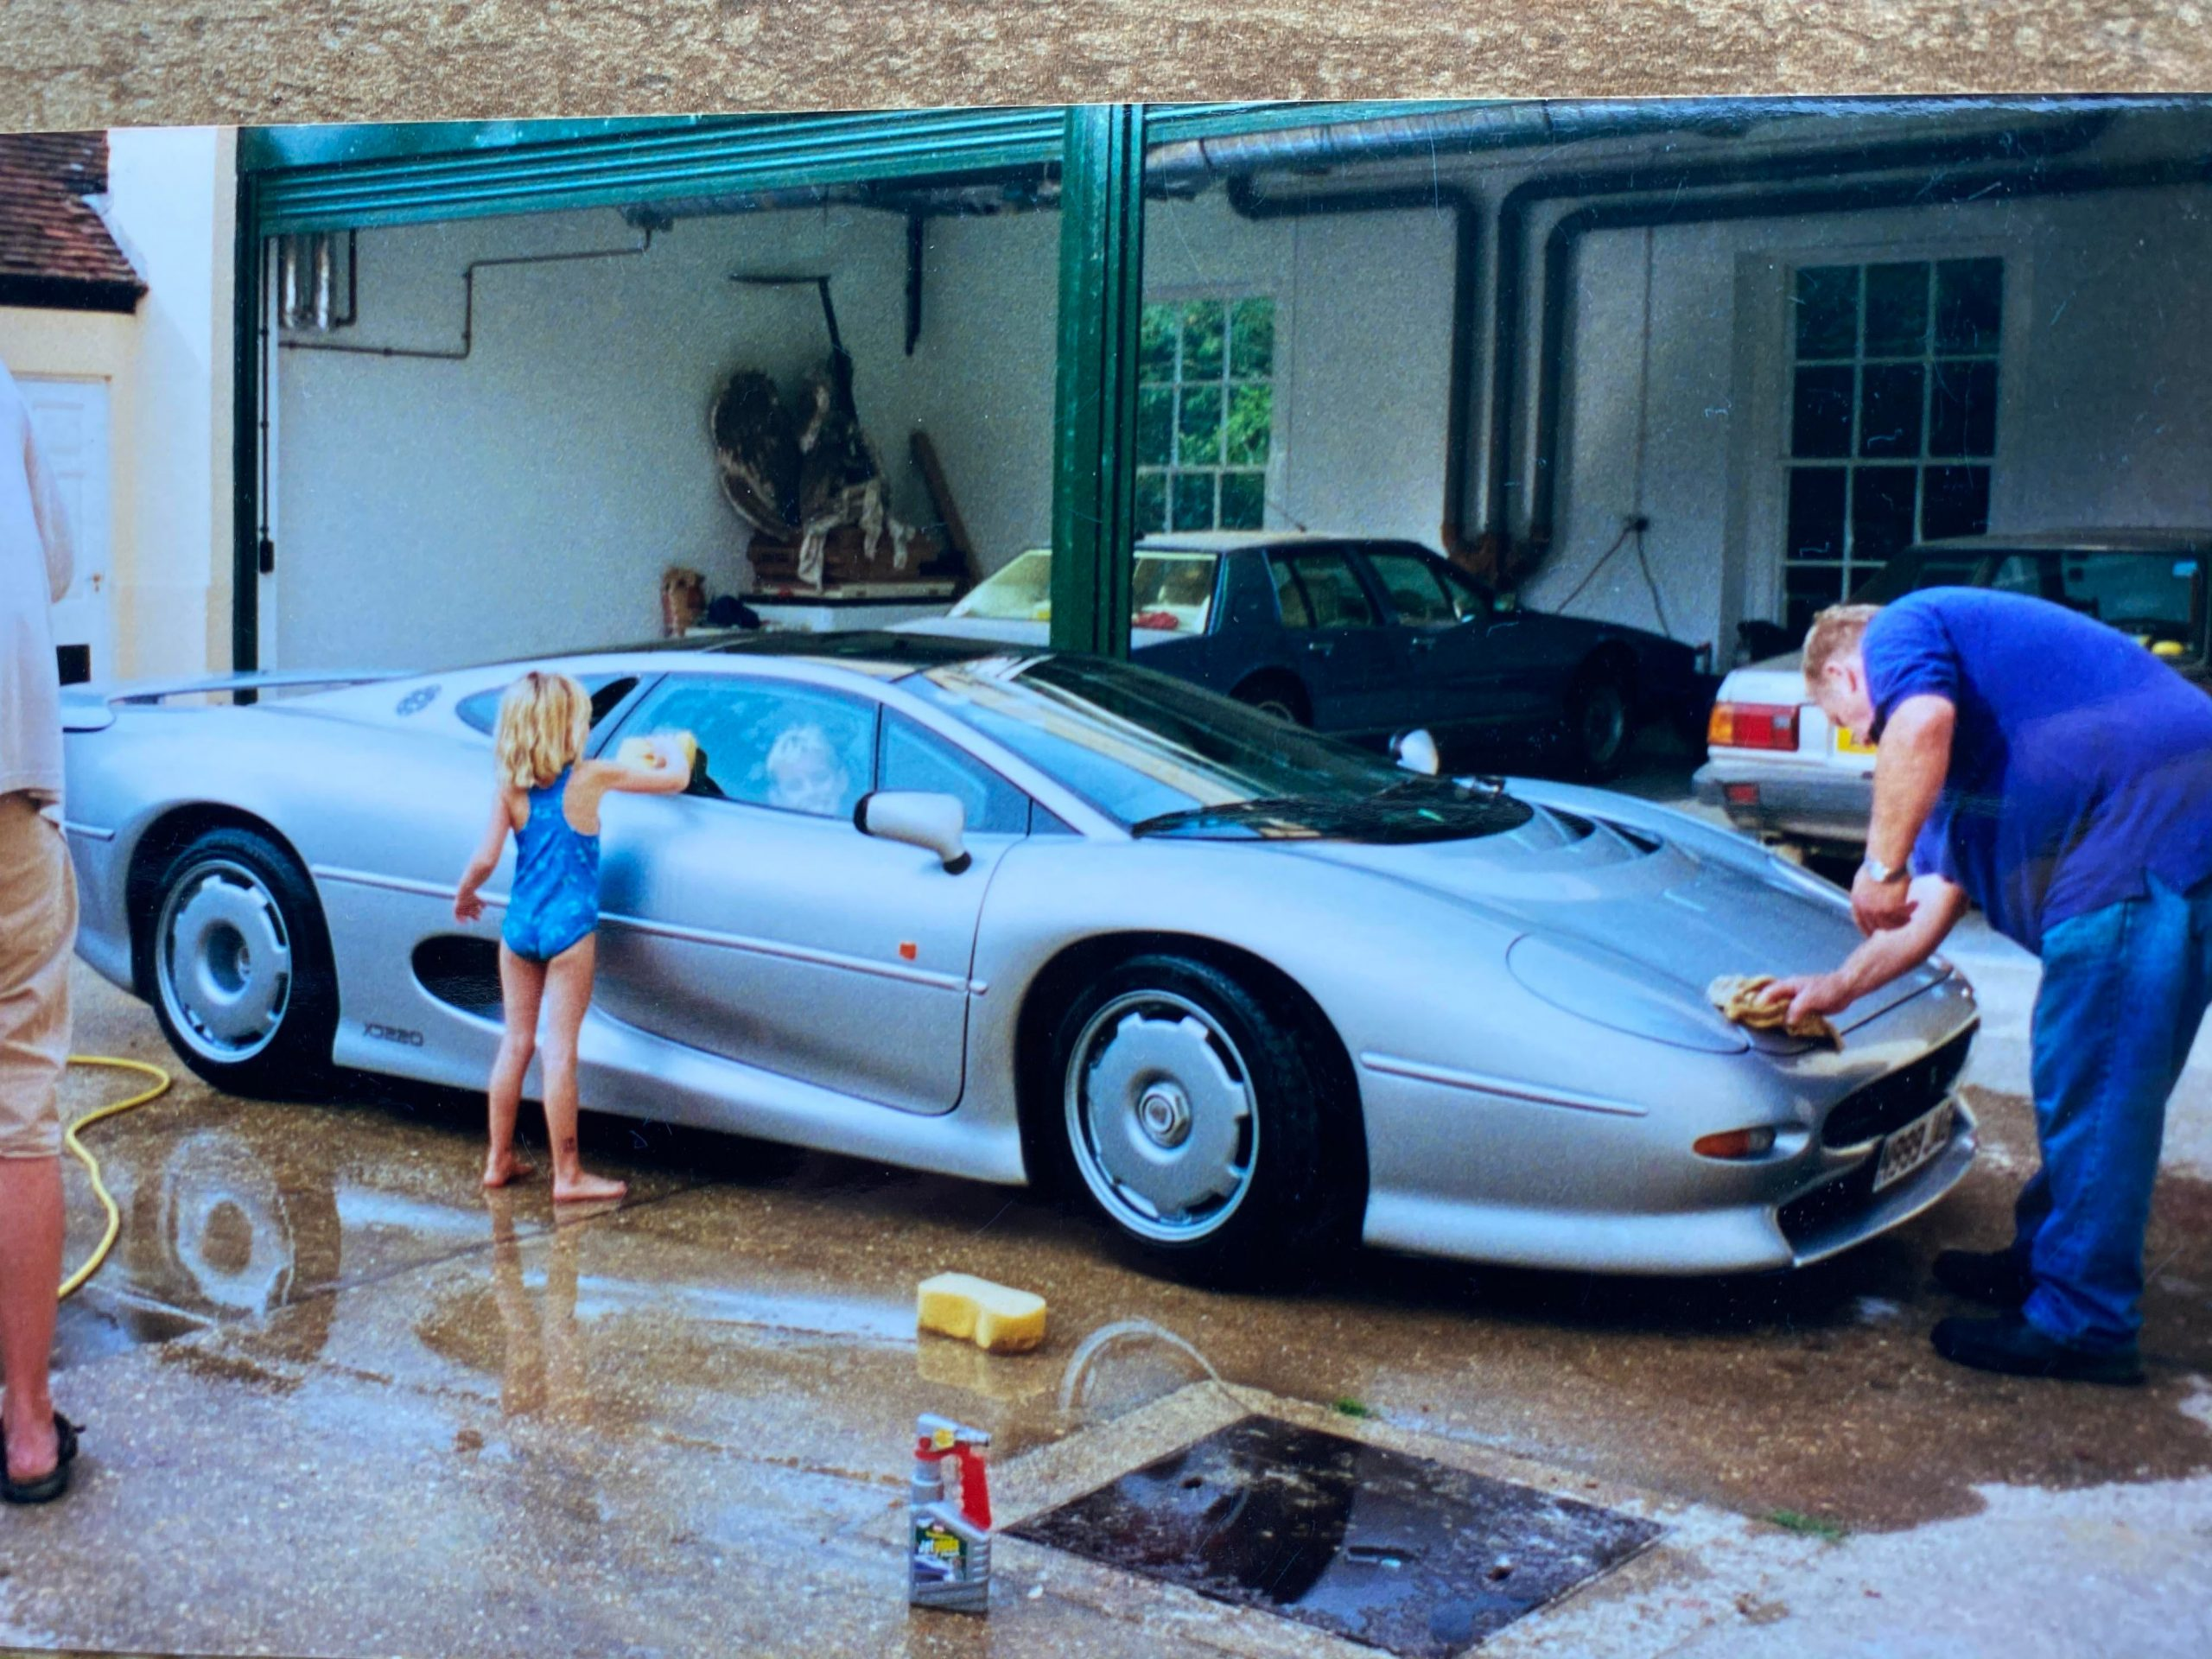 Me when I was 6 behind the wheel of XJ 220, gettin a wash. Circa 2000